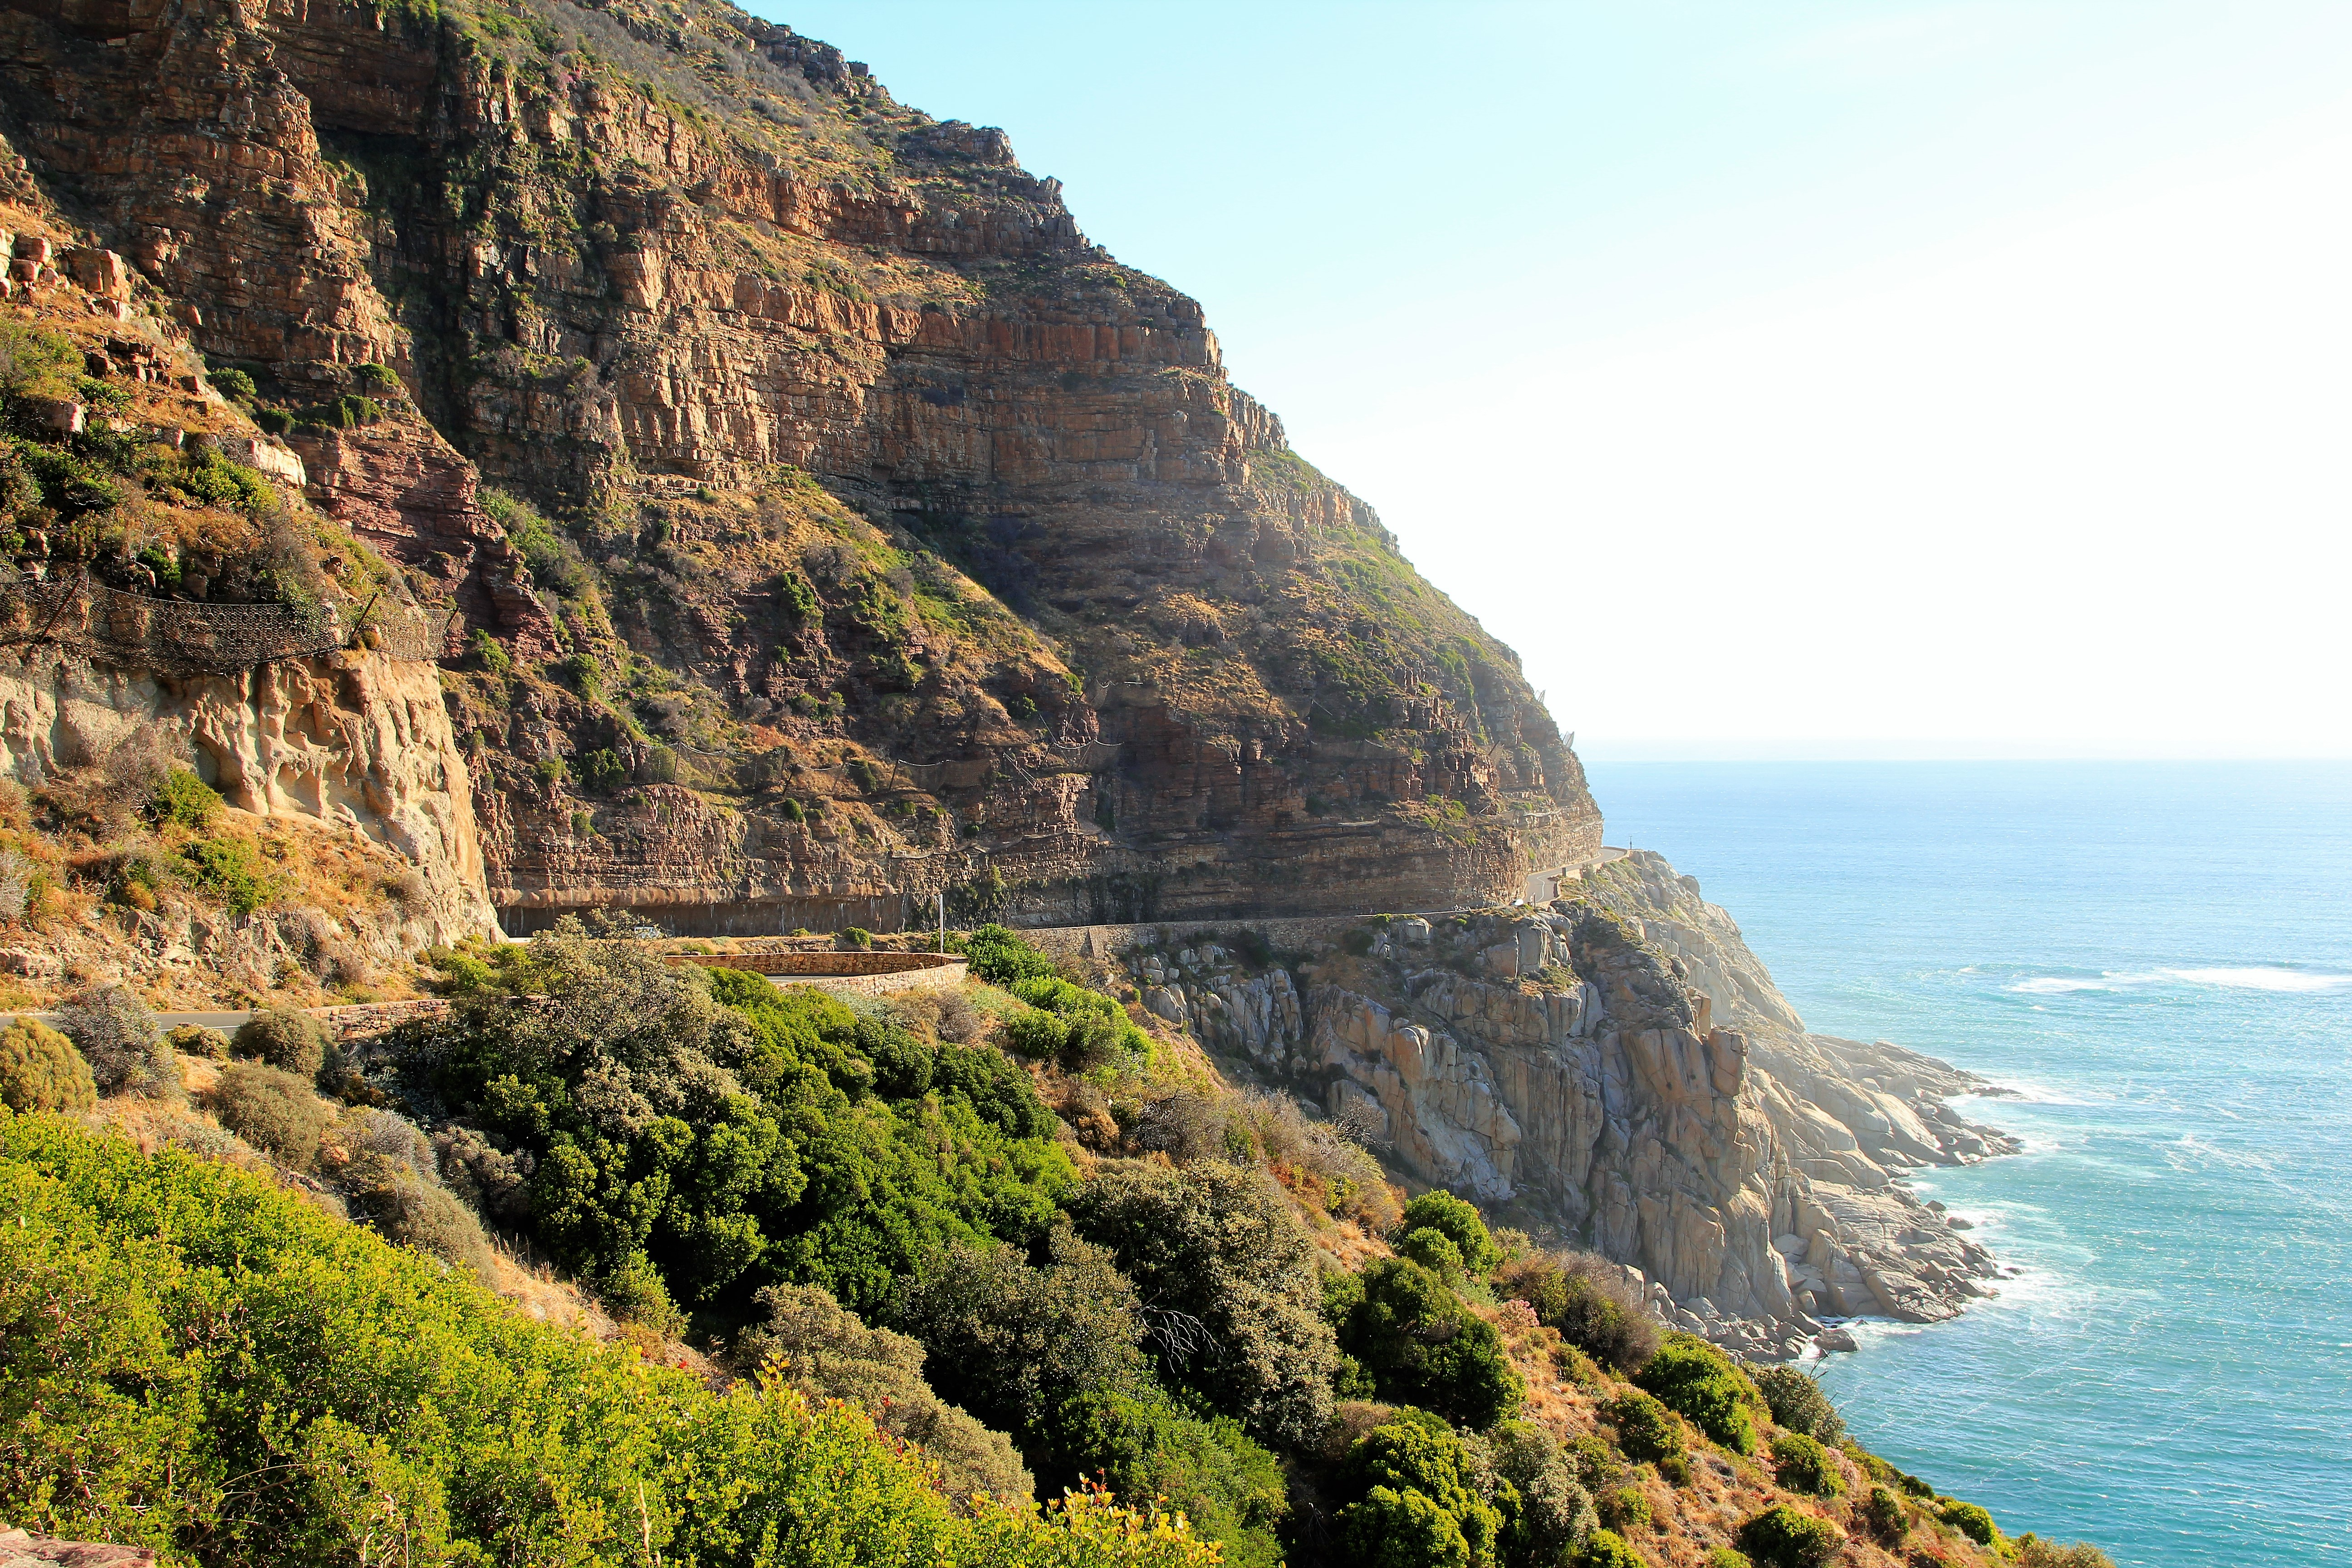 Chapman's Peak Cliff-edge Drive